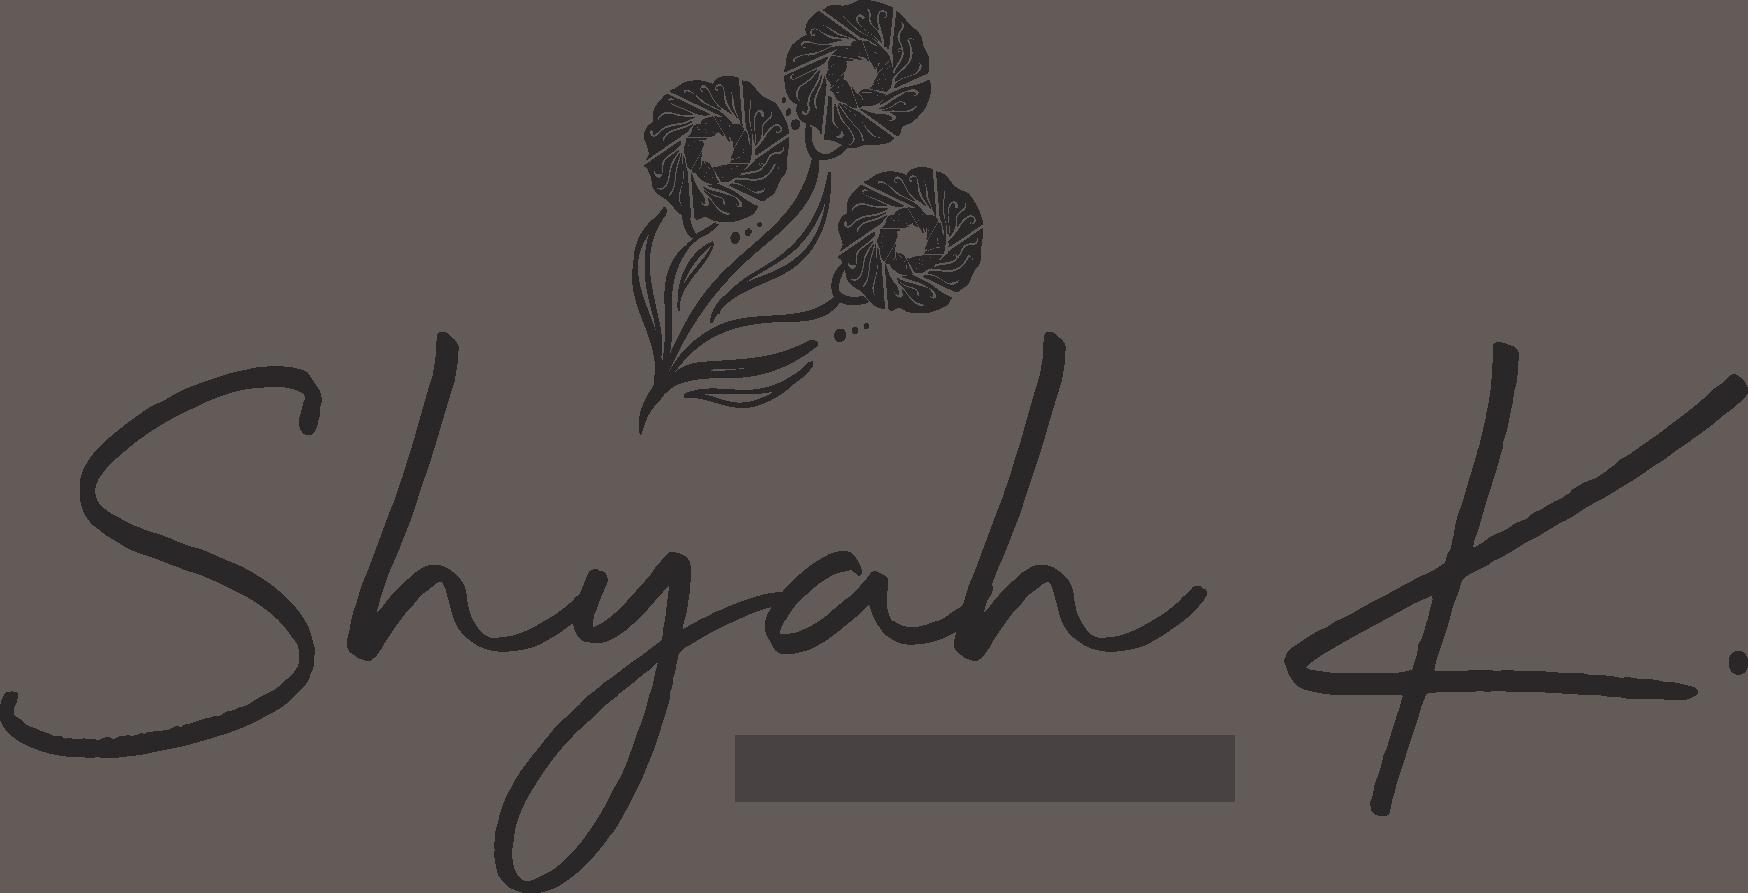 Shyah K. Films